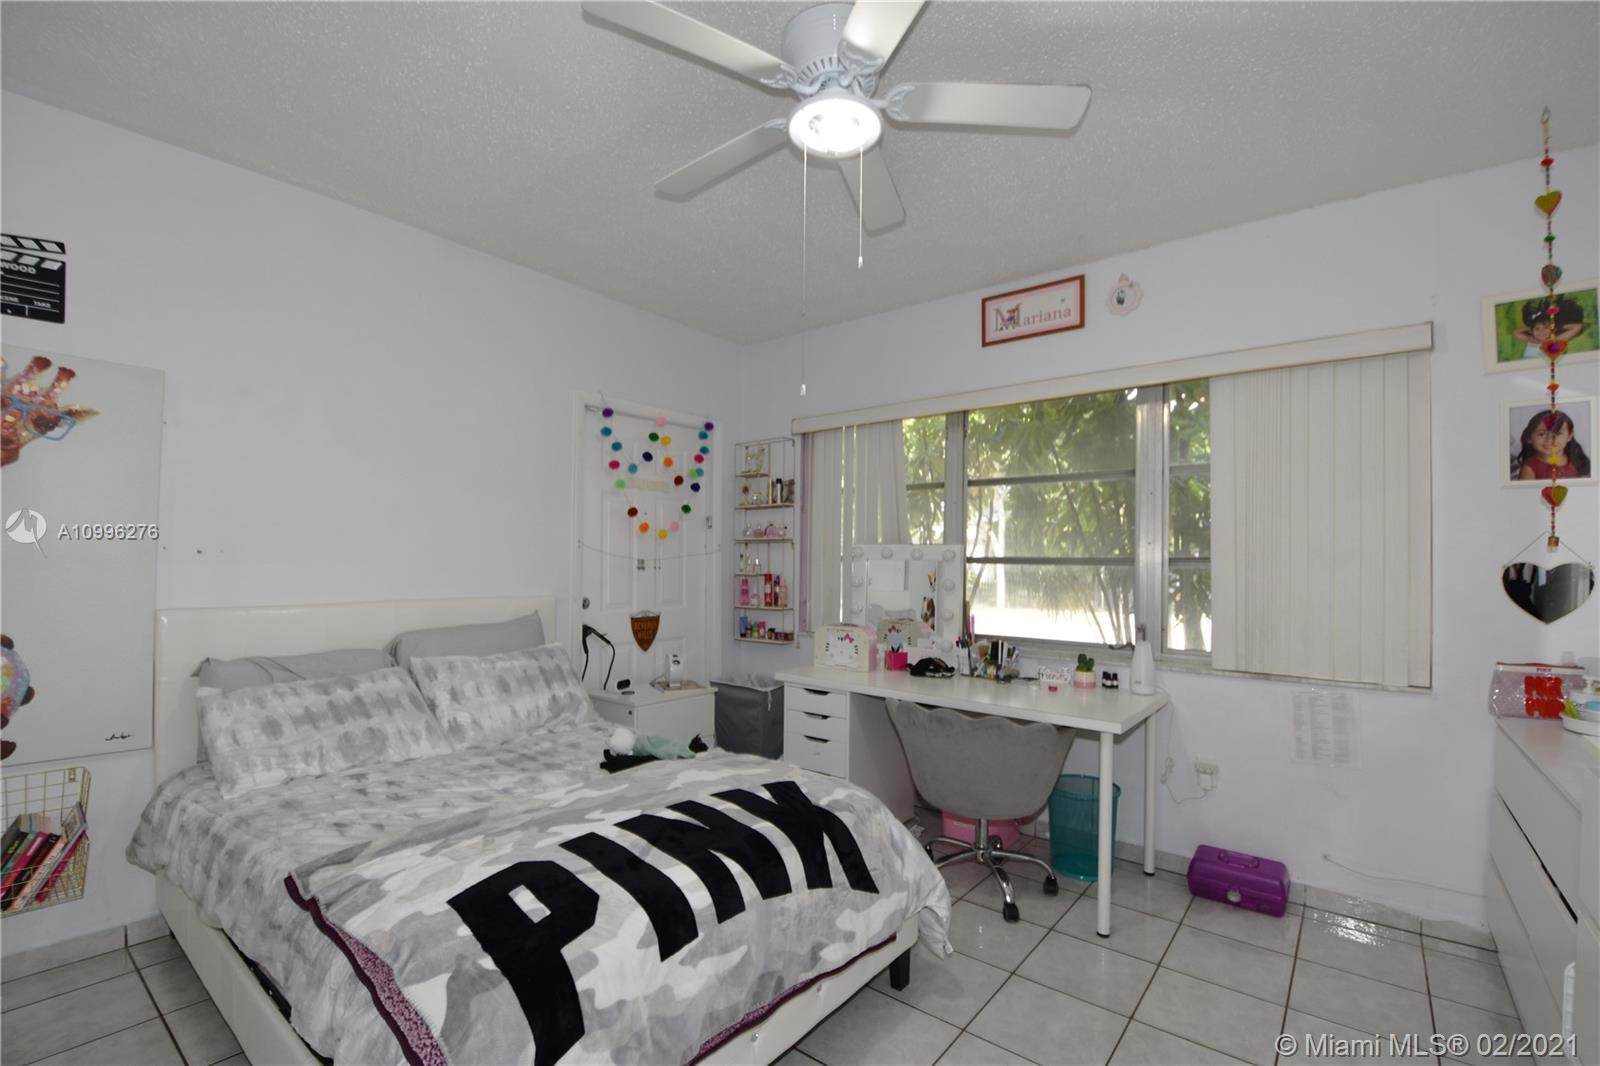 Sky Lake, 2110 NE 191st Dr, North Miami Beach, Florida 33179, image 21